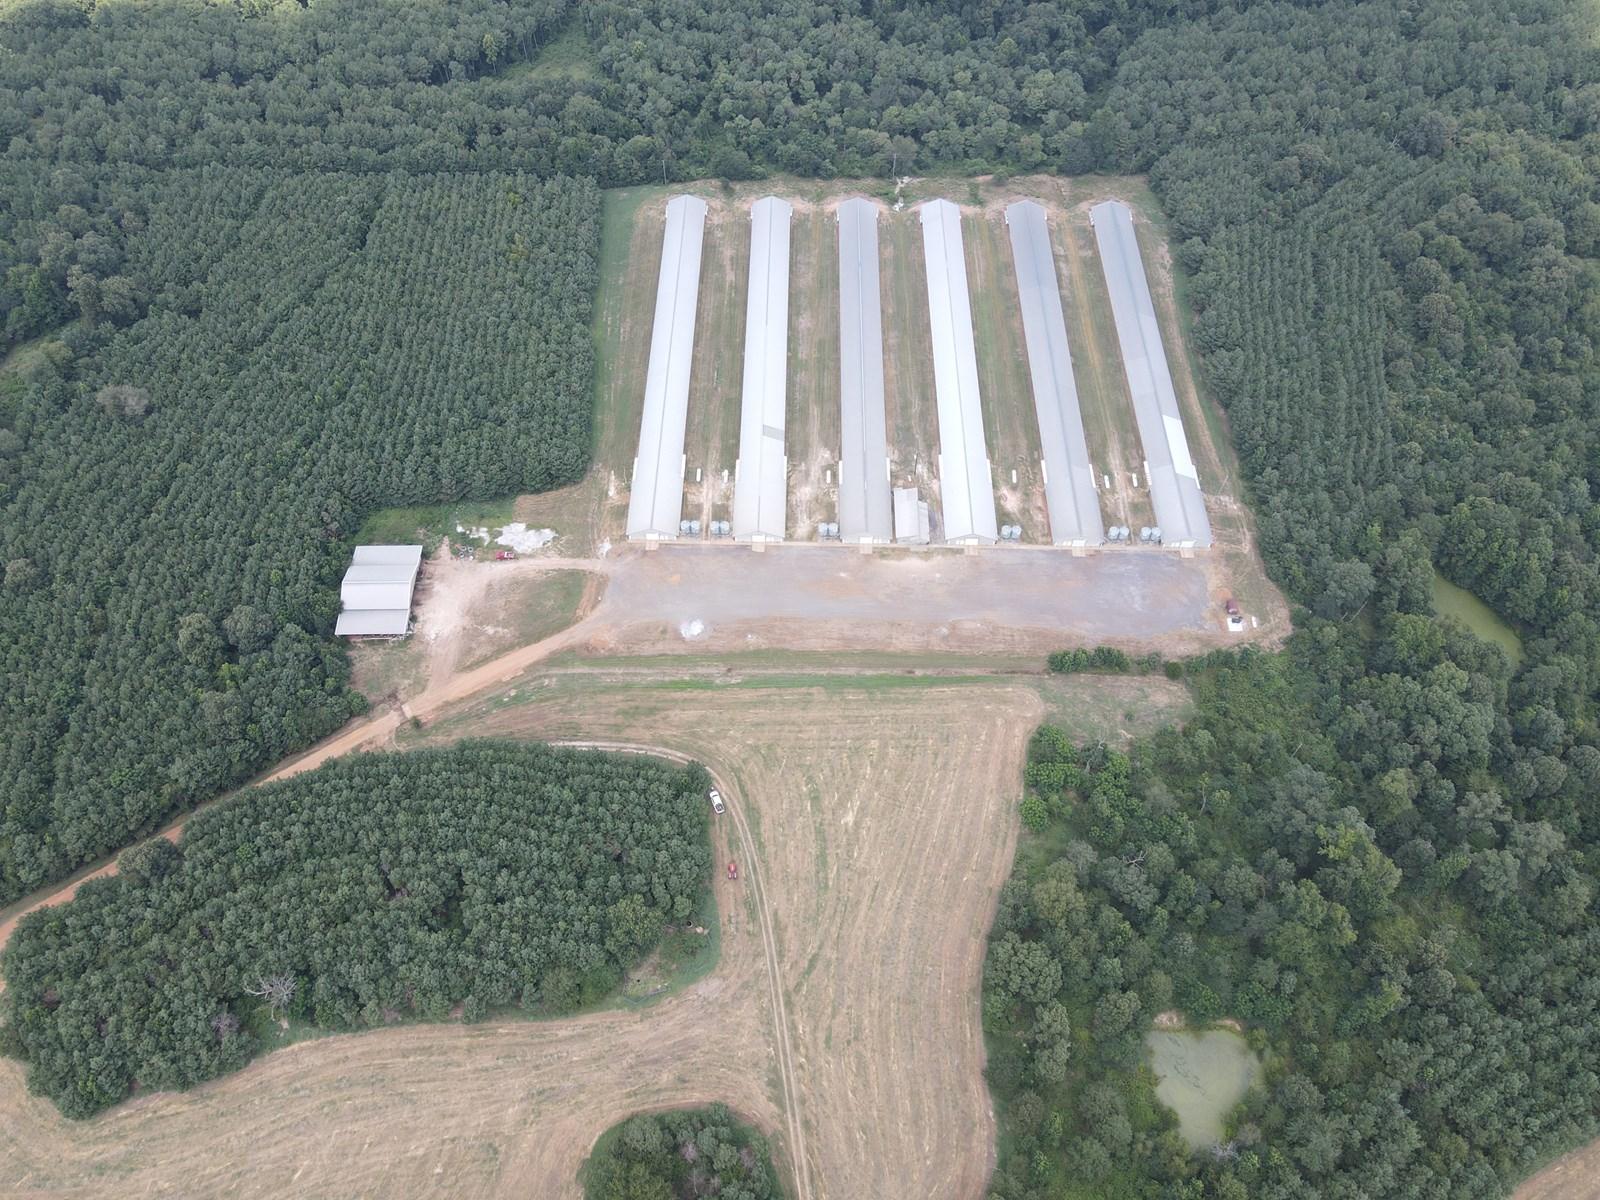 East Texas Poultry Farm for Sale